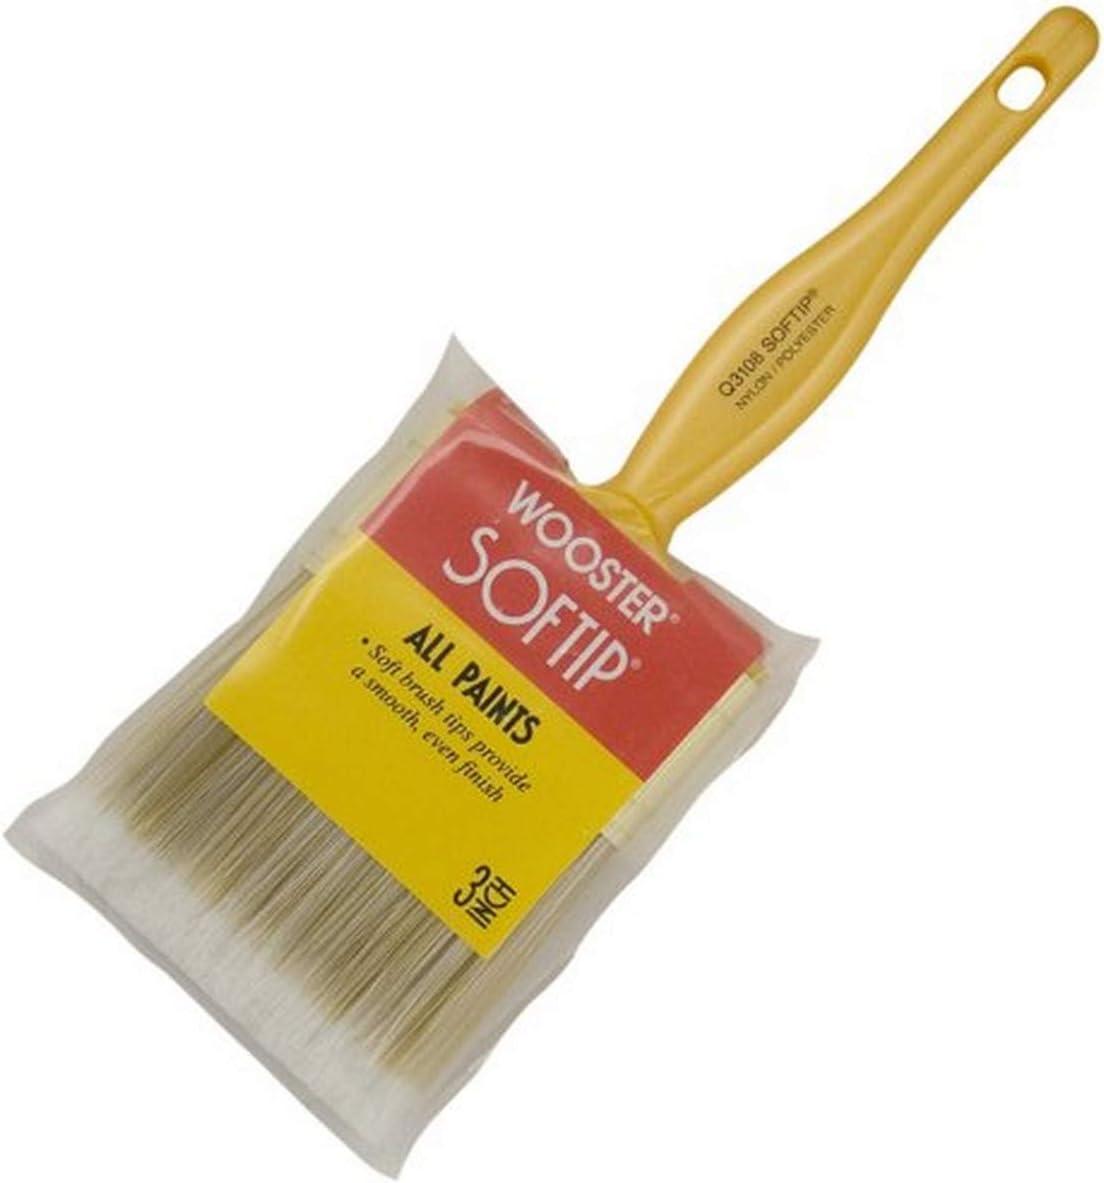 2-Inch Wooster Brush Q3108-2 Softip Paintbrush